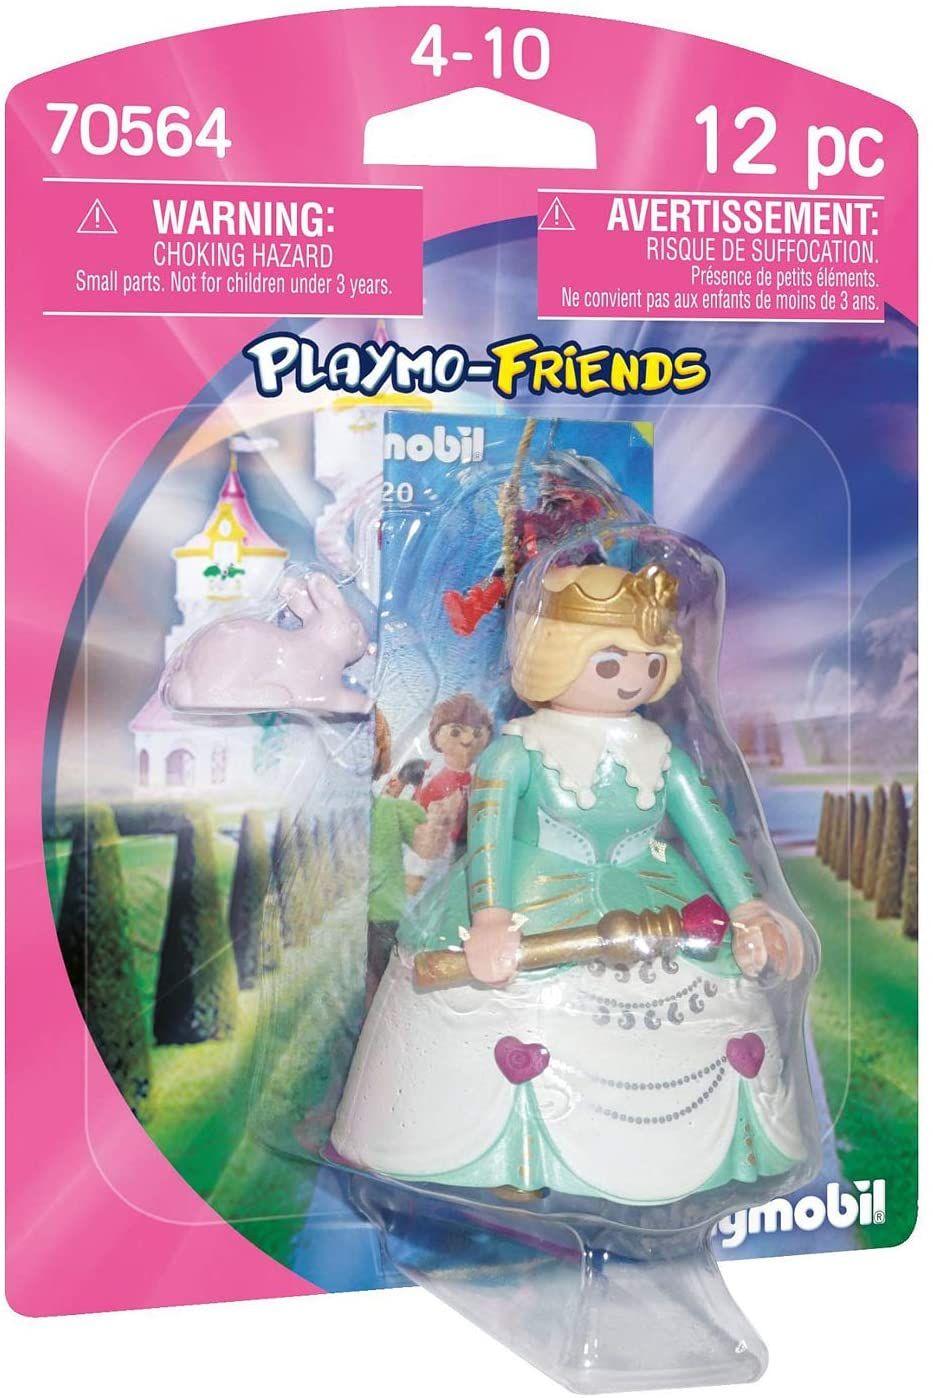 [Amazon Prime / Bücher.de] PLAYMOBIL PLAYMO-FRIENDS 70564 Prinzessin, Ab 4 Jahren